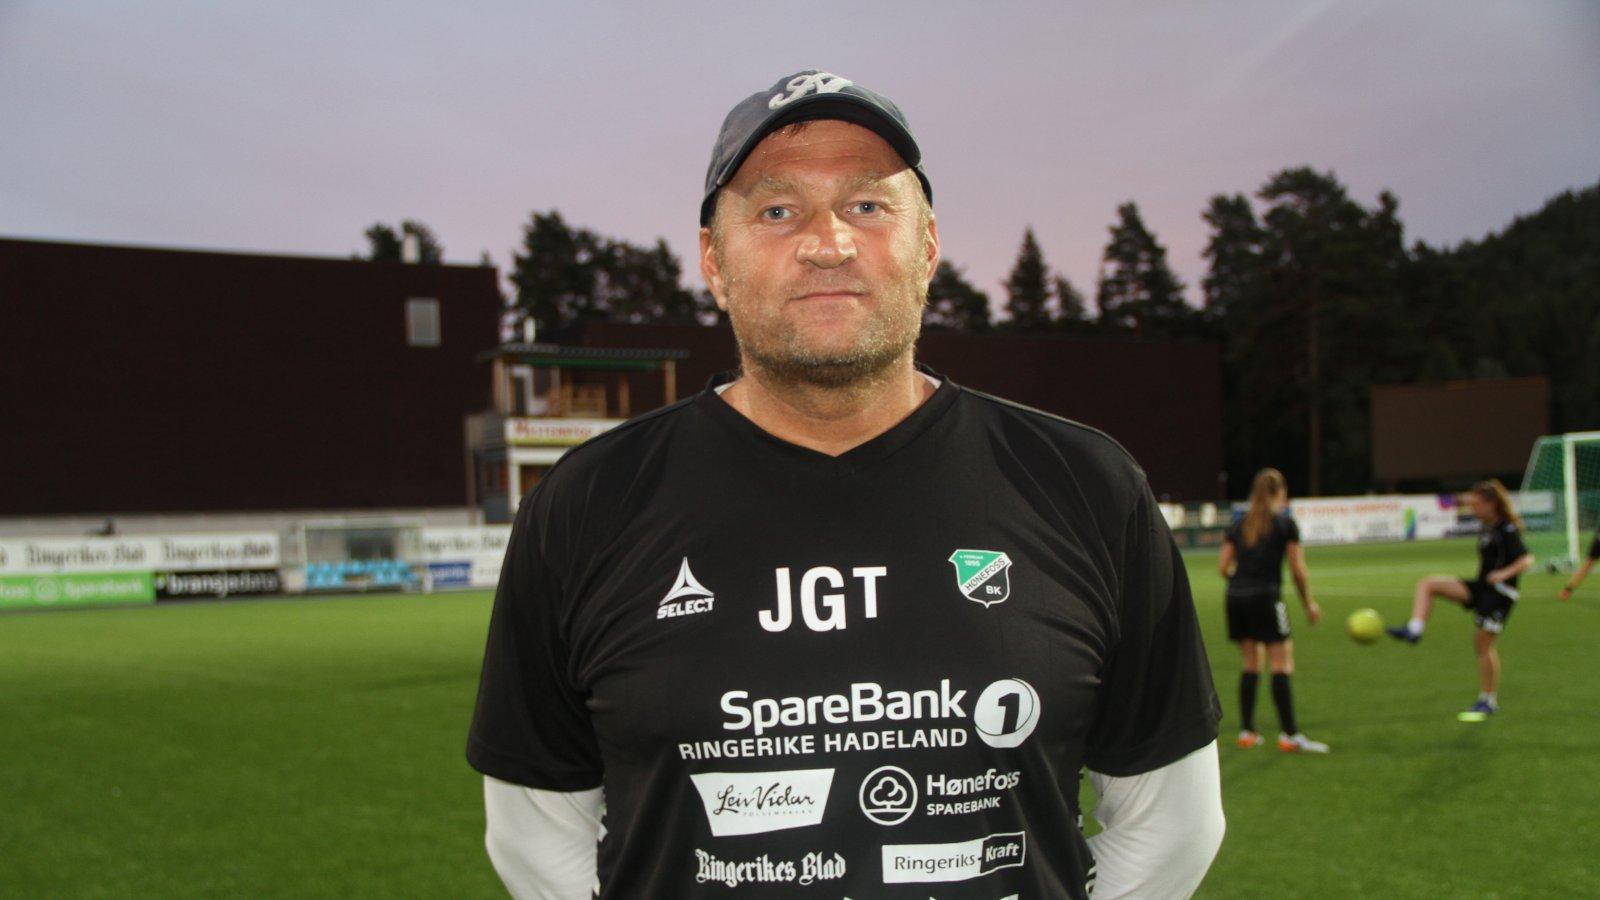 Jan Gundro Thorstensen